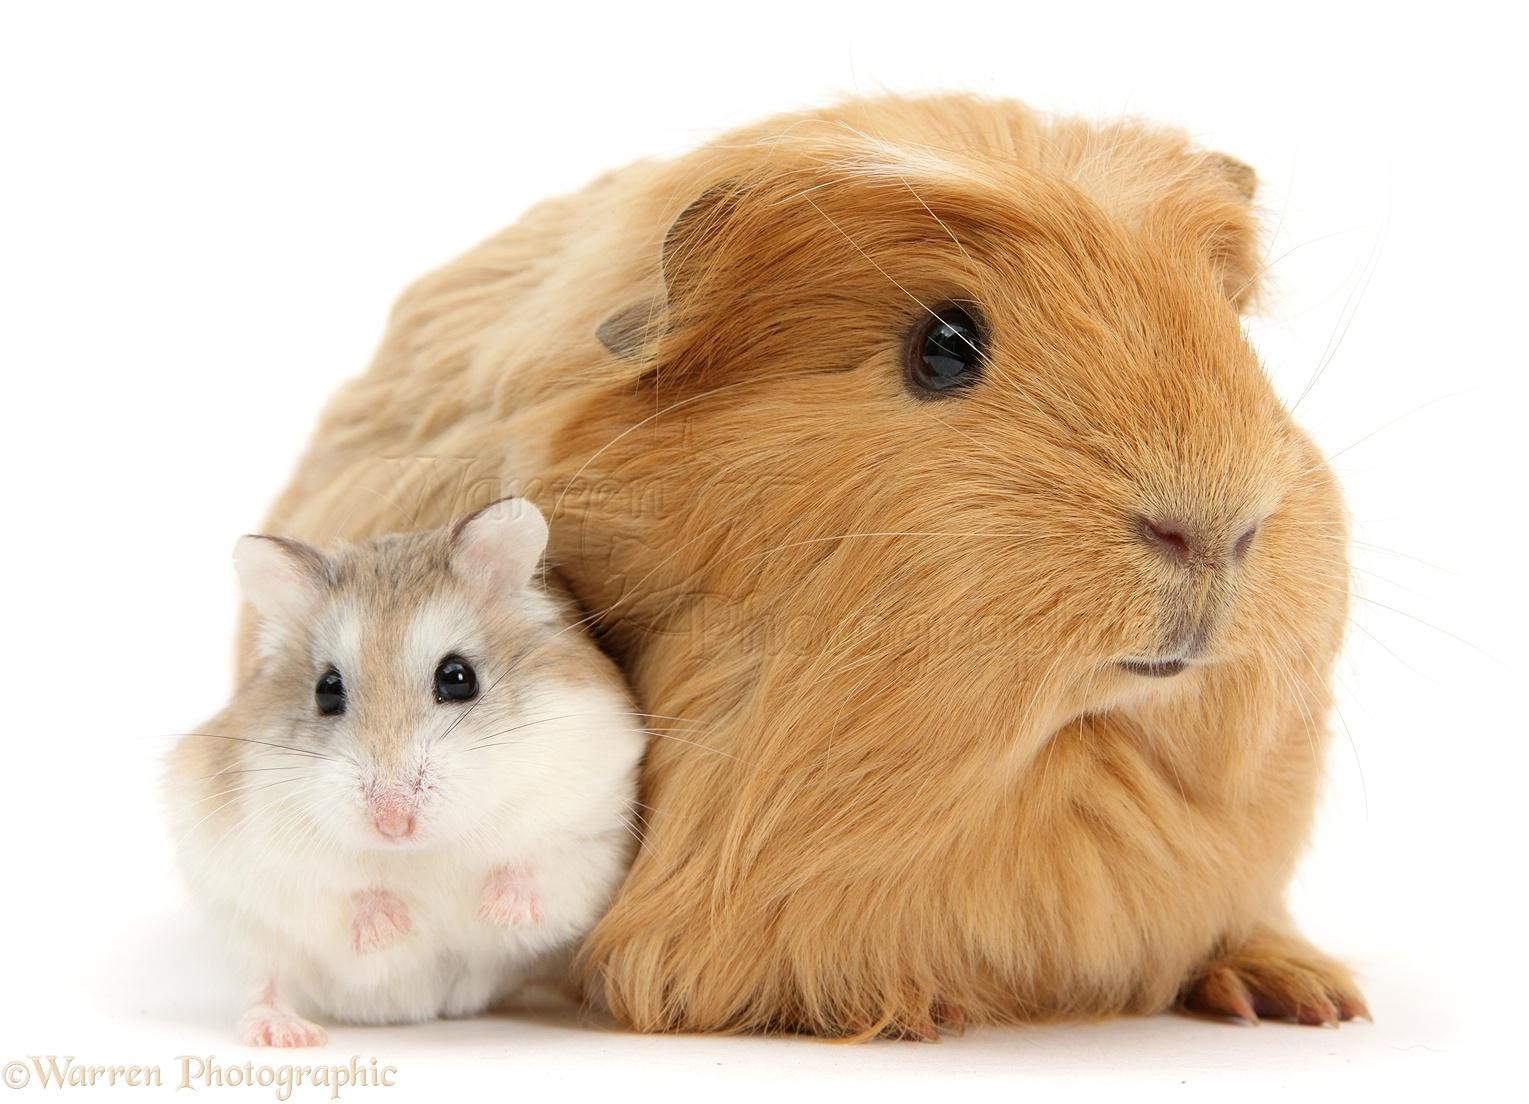 Uncategorized Hamster And Guinea Pig ginger guinea pig and roborovski hamster photo wp39166 hamster